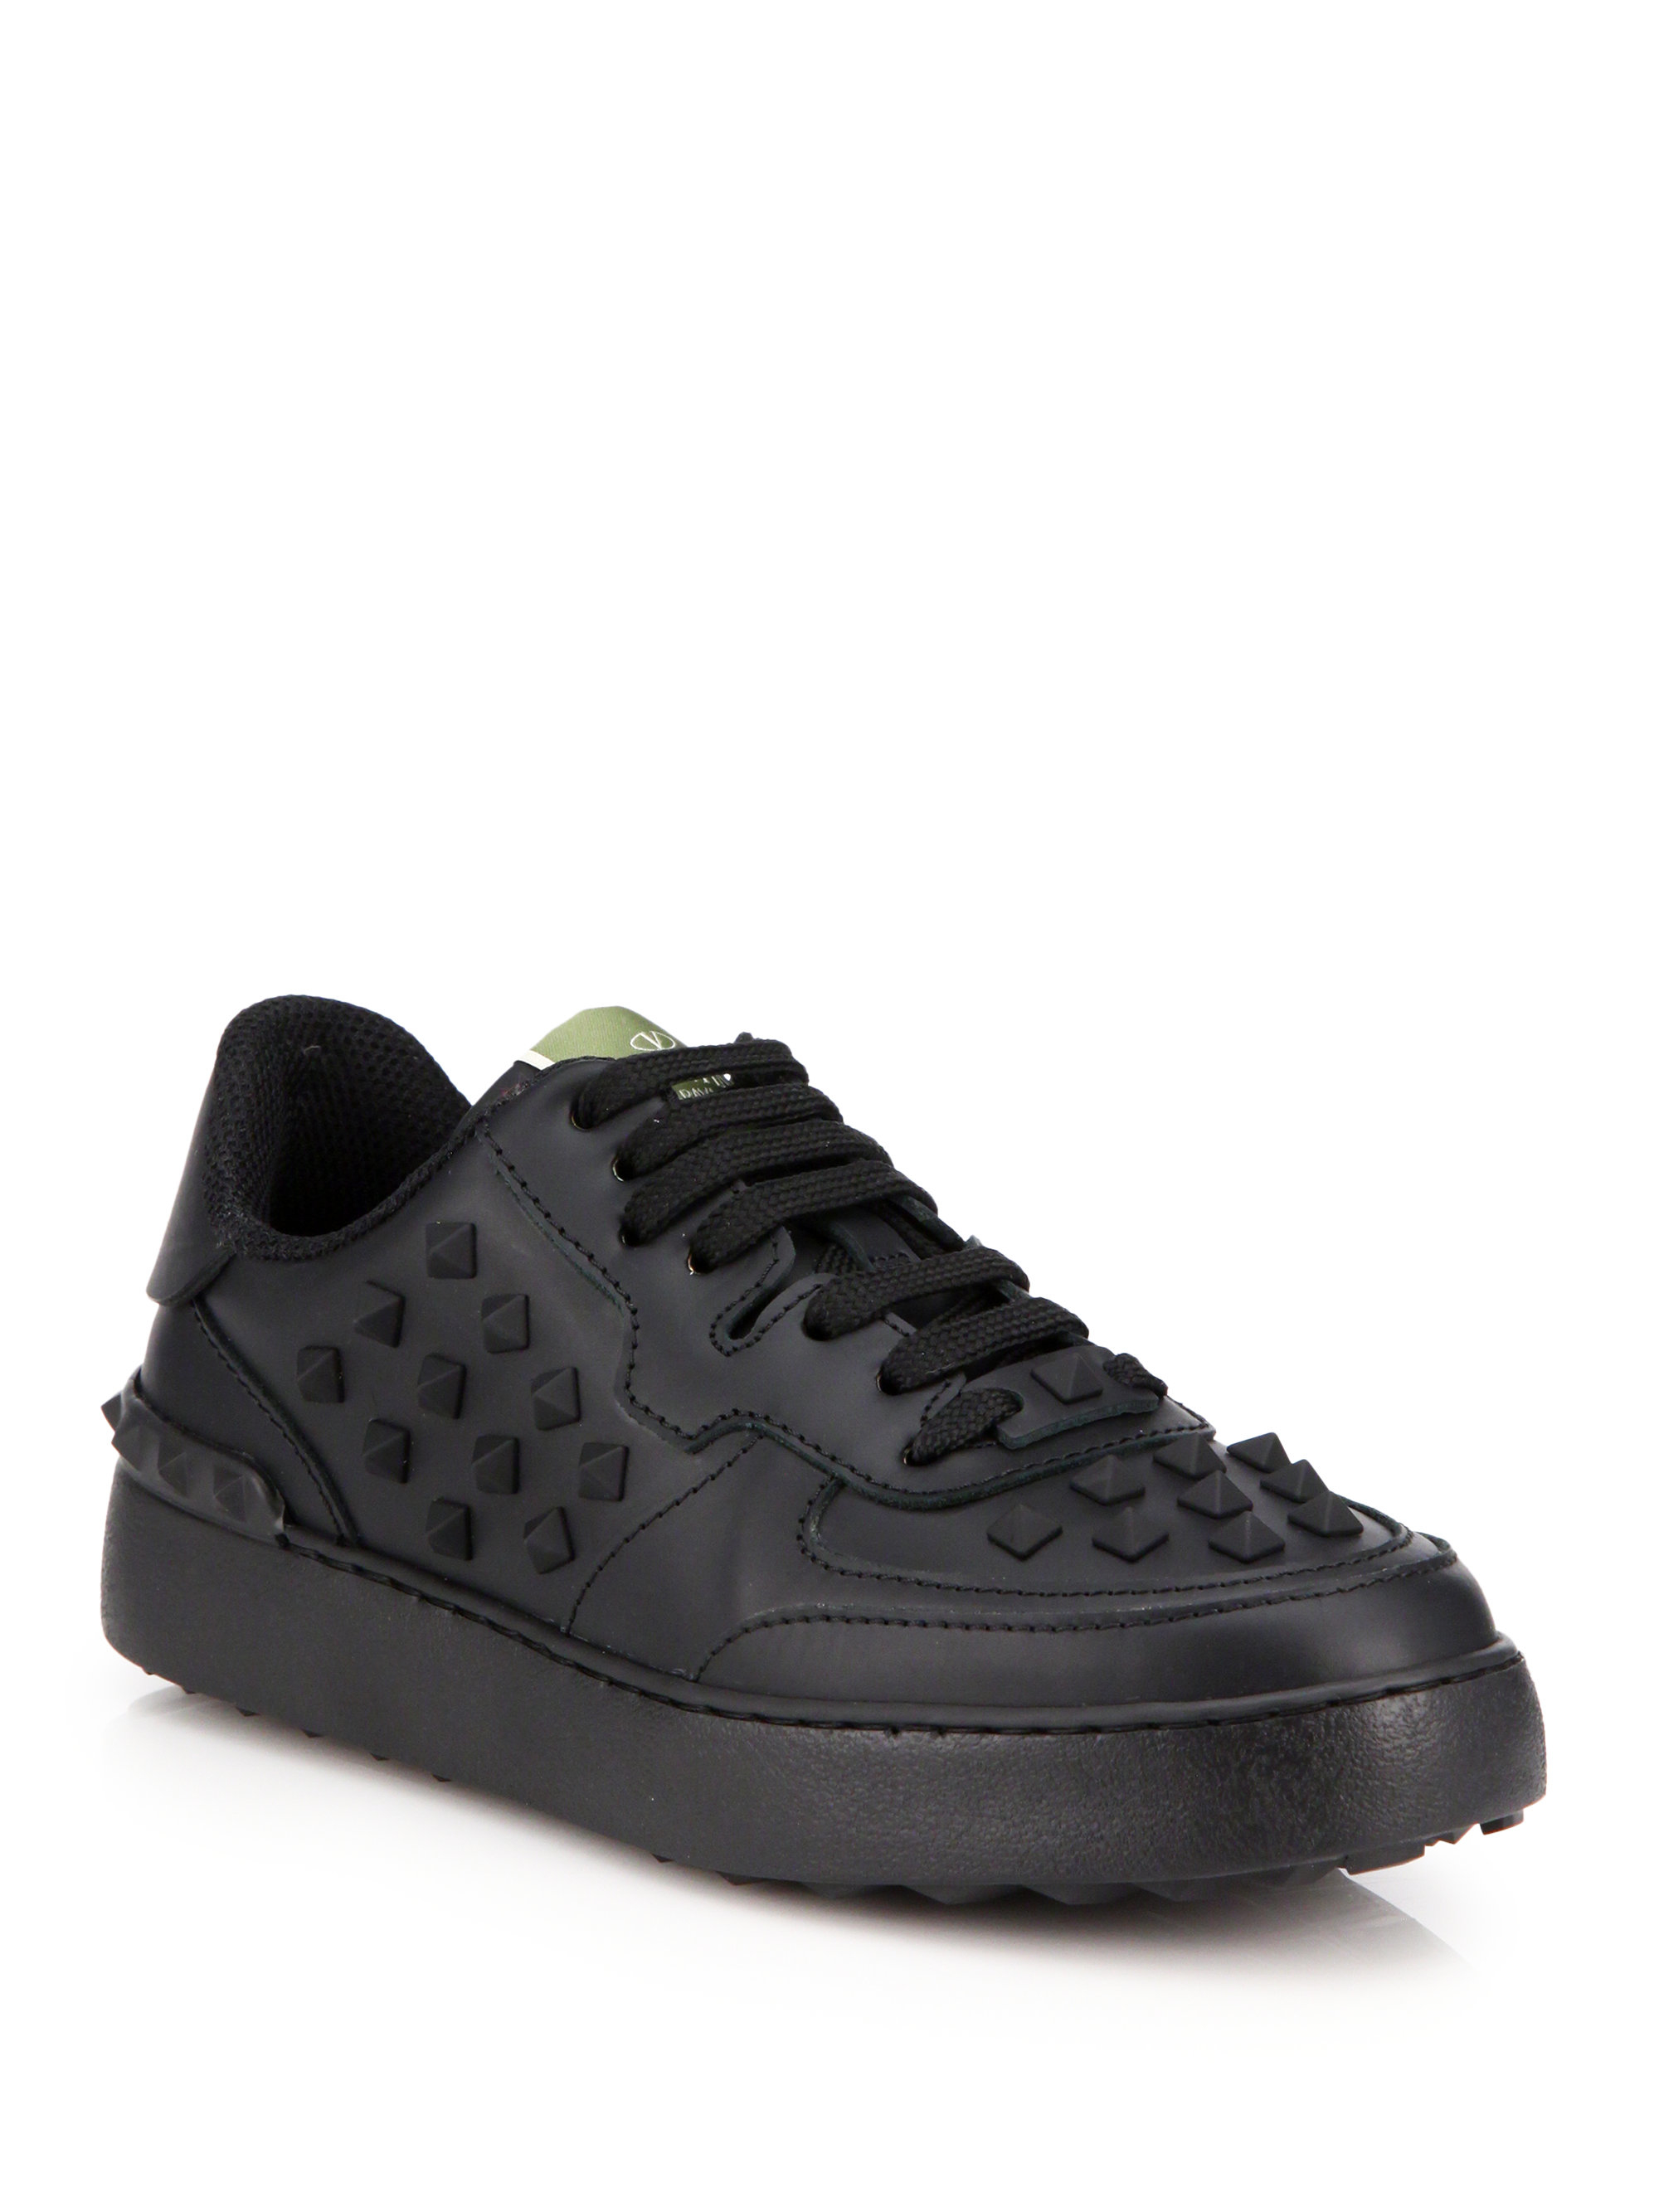 Valentino Rockstud Leather Trainers zw5rDypeFv